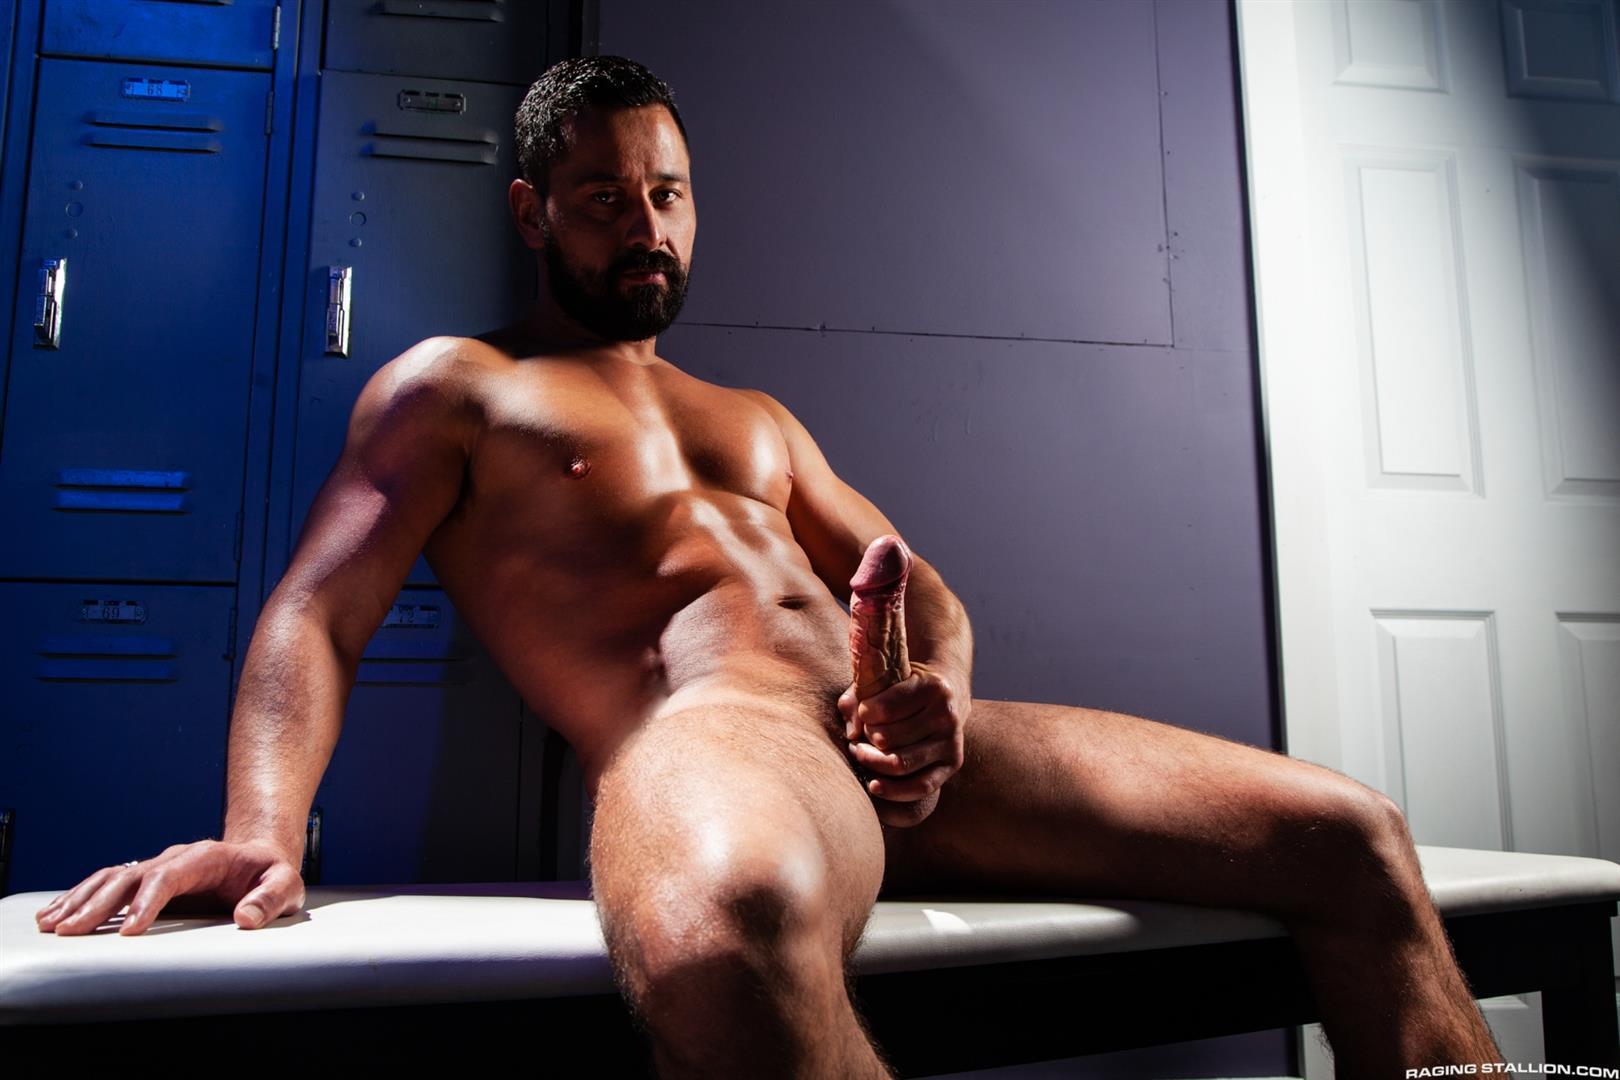 Raging-Stallion-Pheonix-Fellington-and-Cristian-Sam-Big-Black-Cocksucking-Video-06 Getting My Big Black Cock Sucked In The DJ Booth